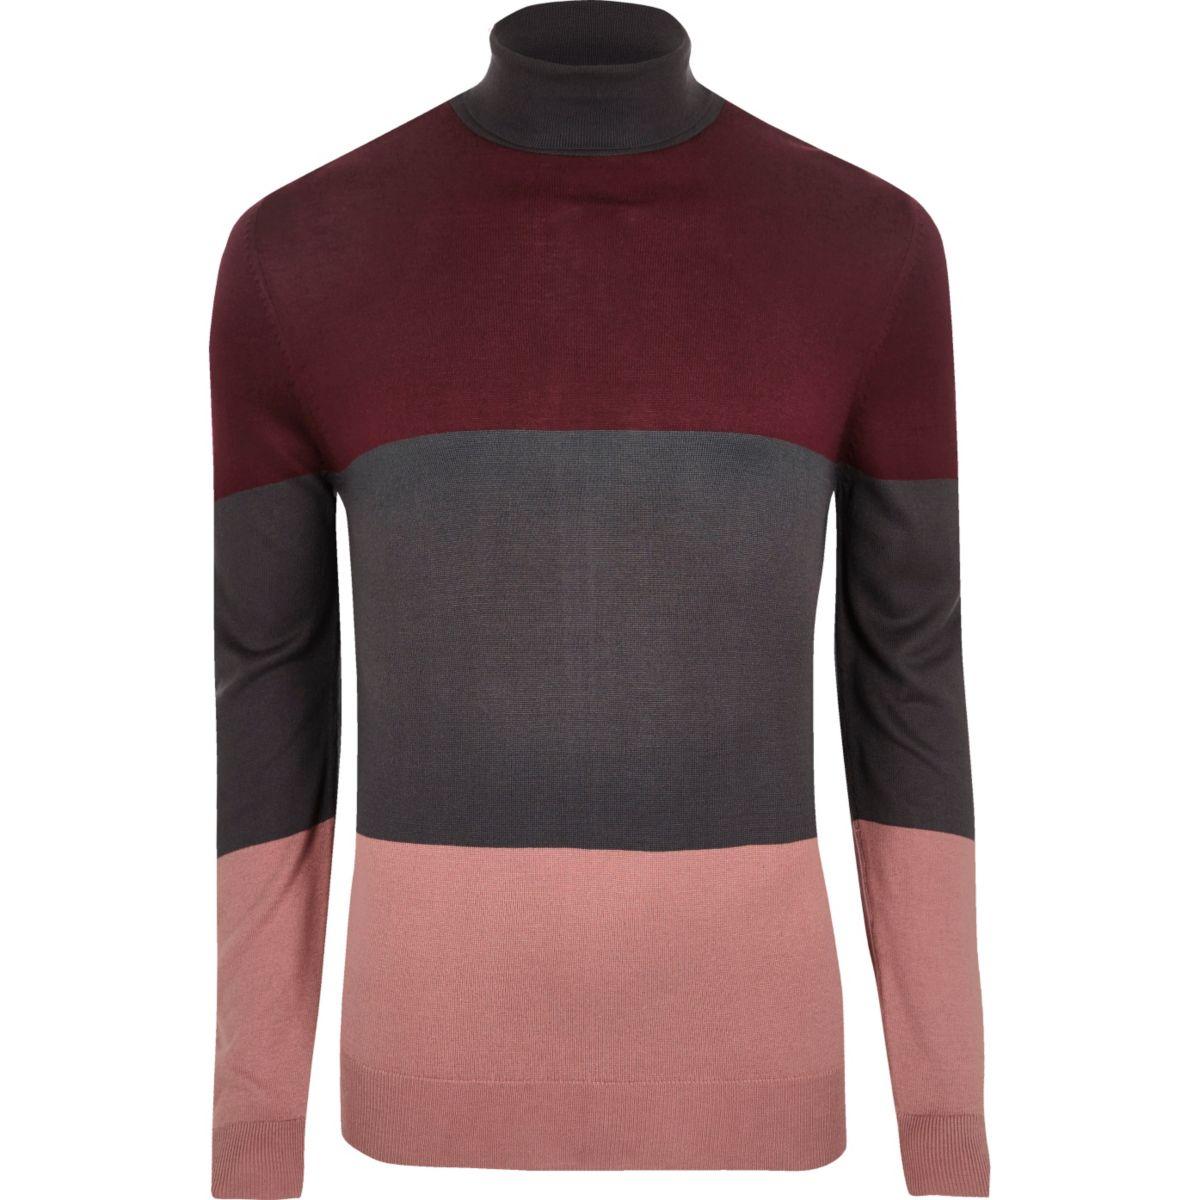 Charcoal grey colour block roll neck jumper